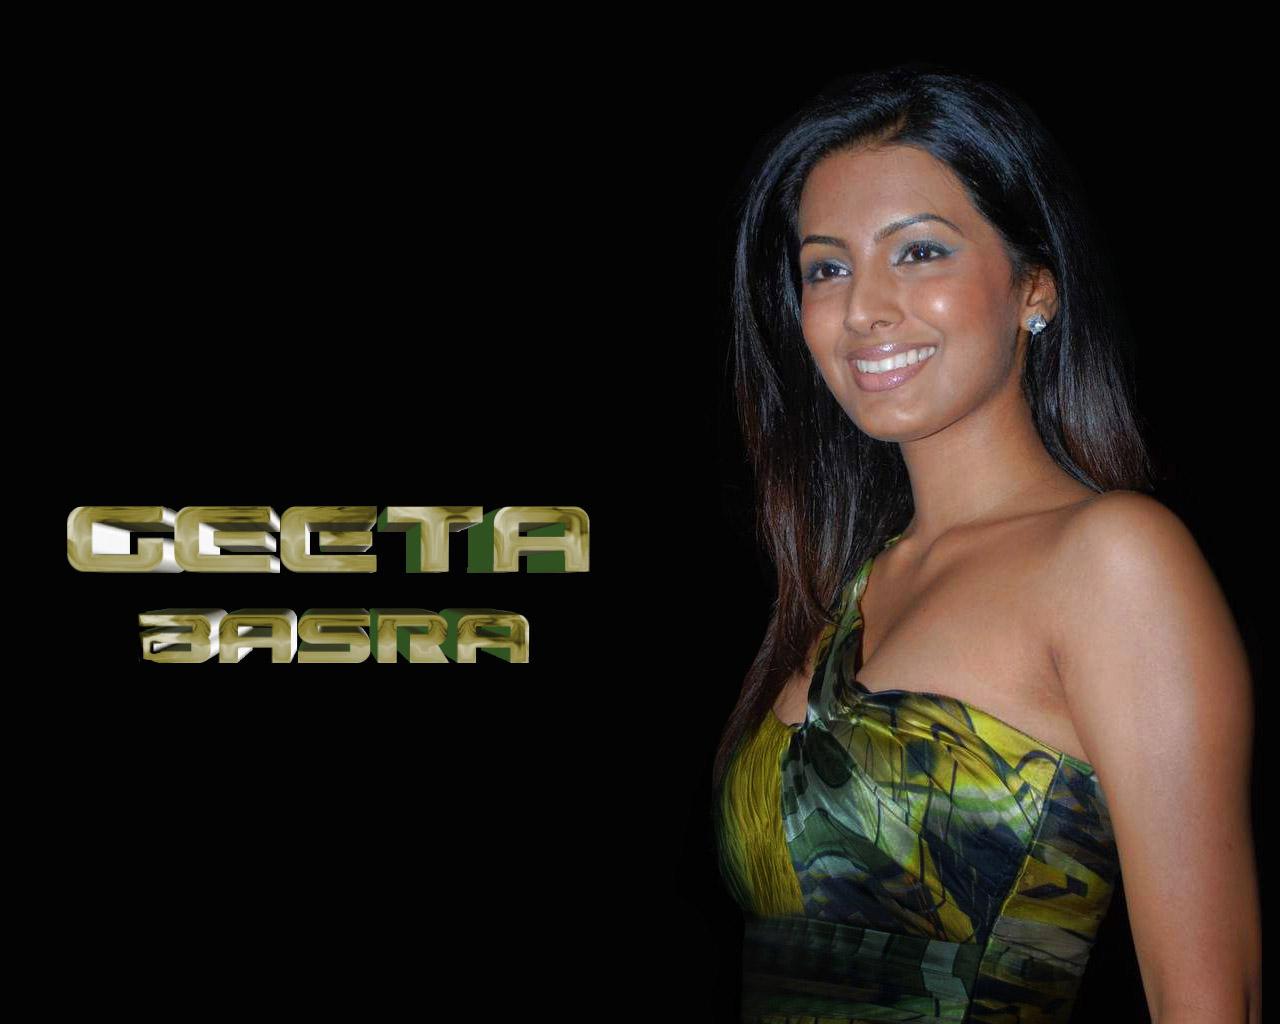 http://3.bp.blogspot.com/_TiCO8op_NpI/TENkhsDDW_I/AAAAAAAARH4/20yiqkultYc/s1600/Geeta+Basra.jpg+%287%29.JPG